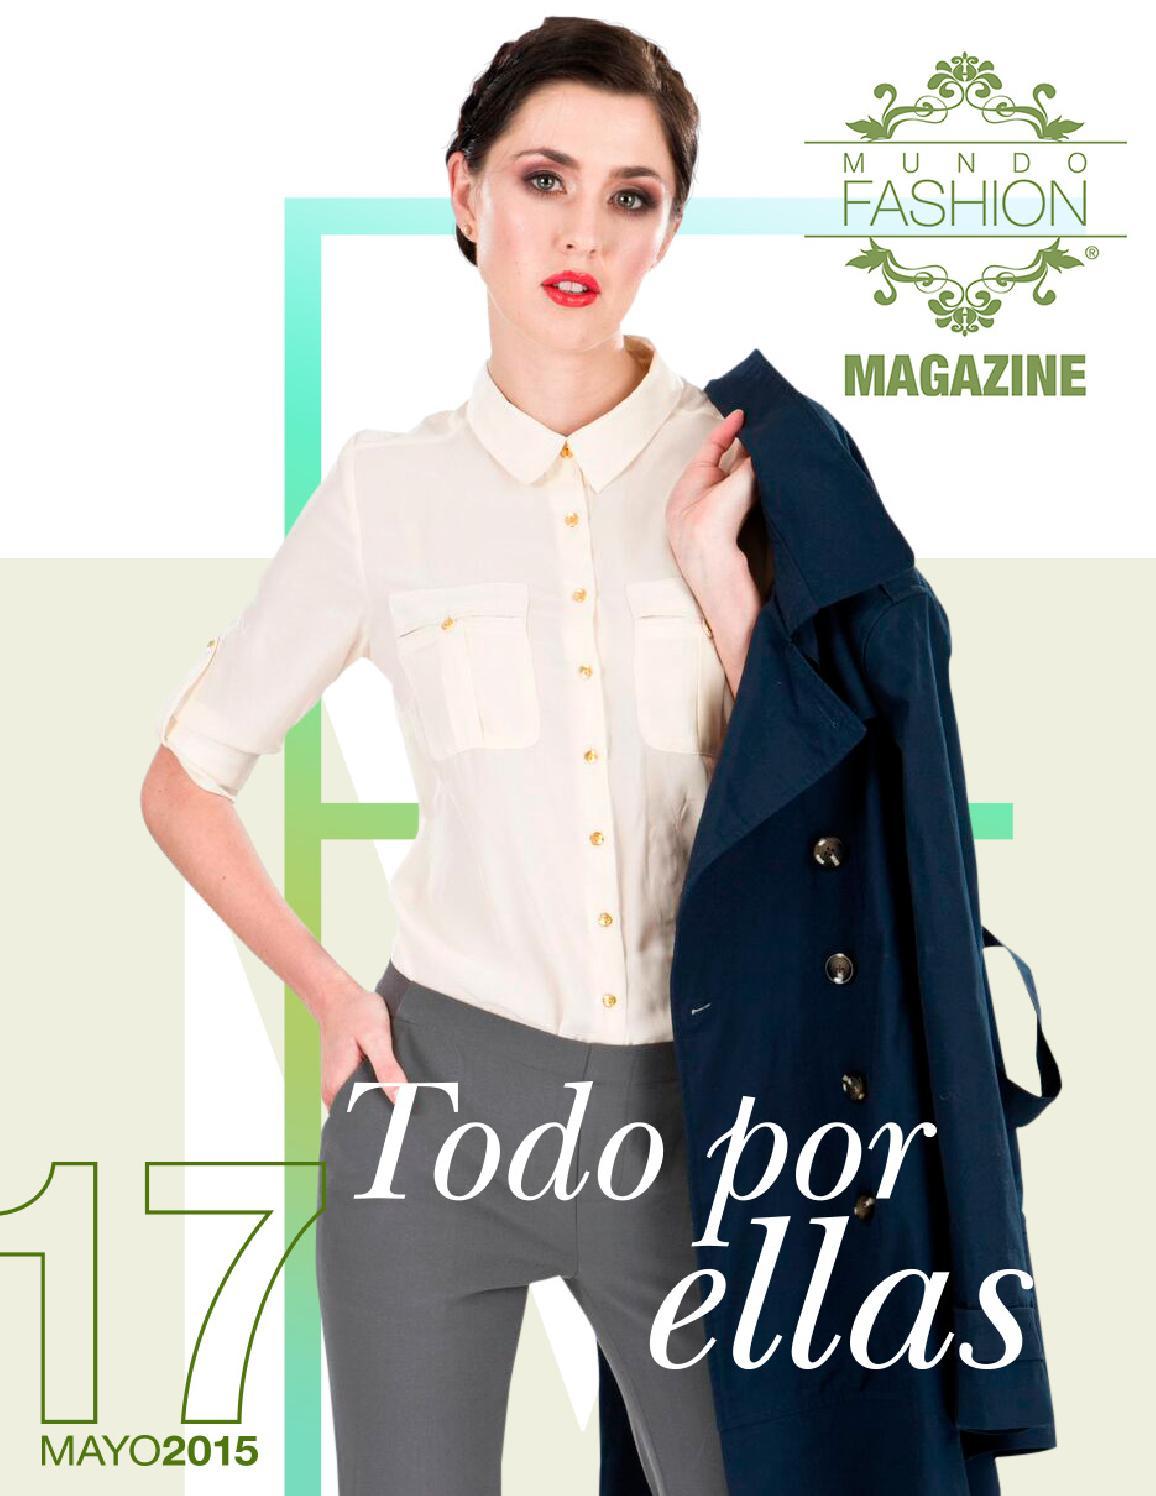 2f0e57fe3 Mundo Fashion 17 - Mayo 2015 by Mundo Fashion - issuu